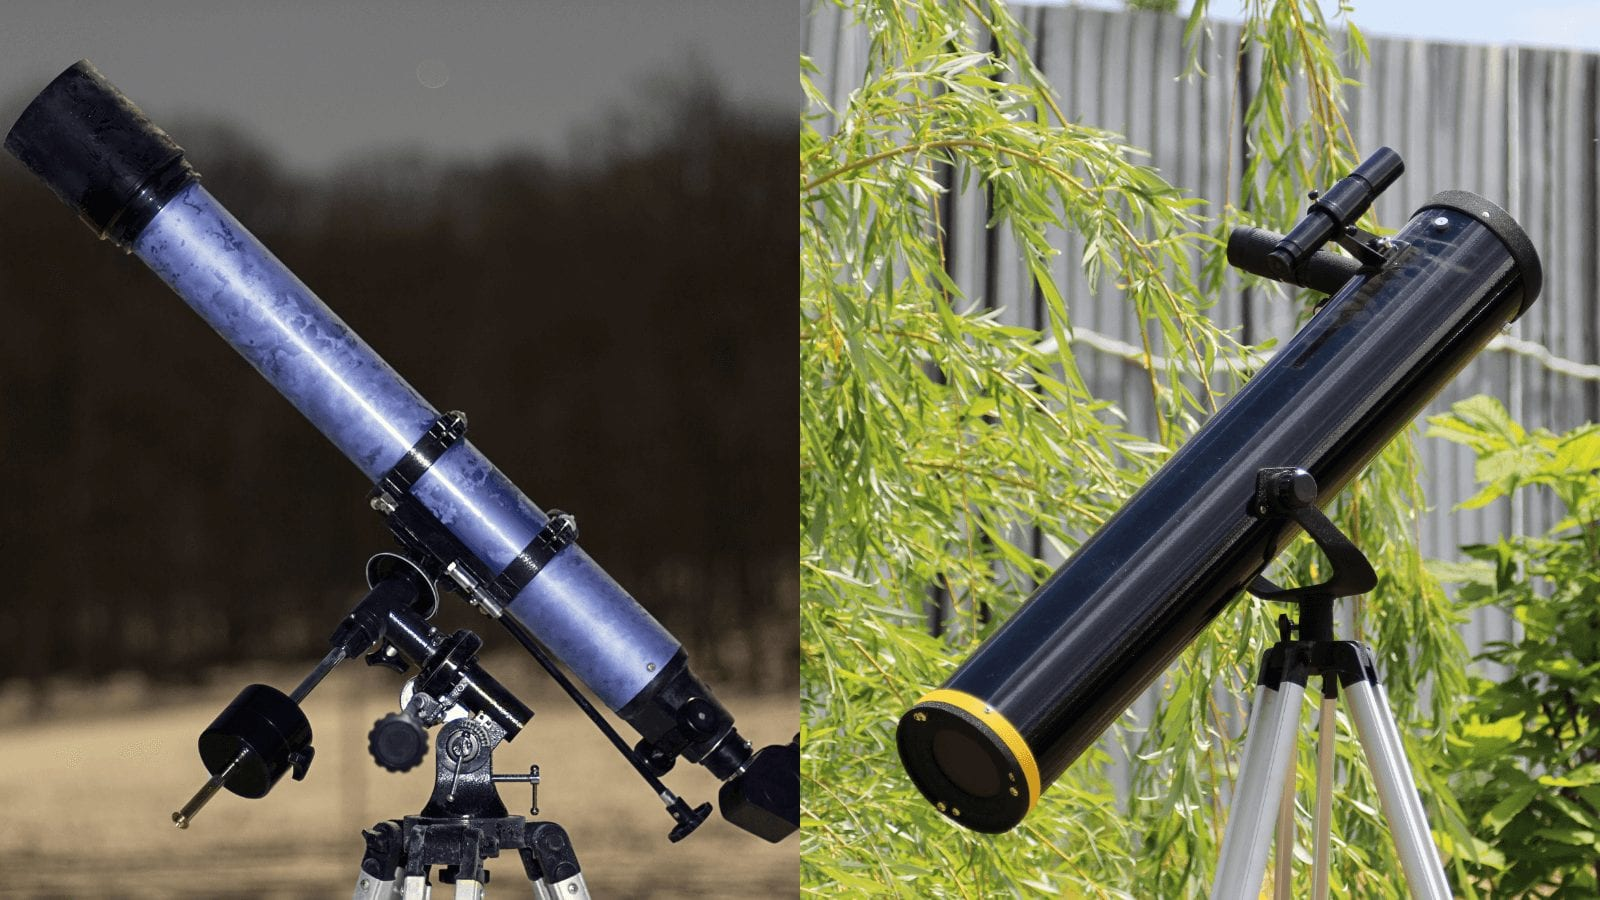 Refractor Telescope next to Reflector Telescope